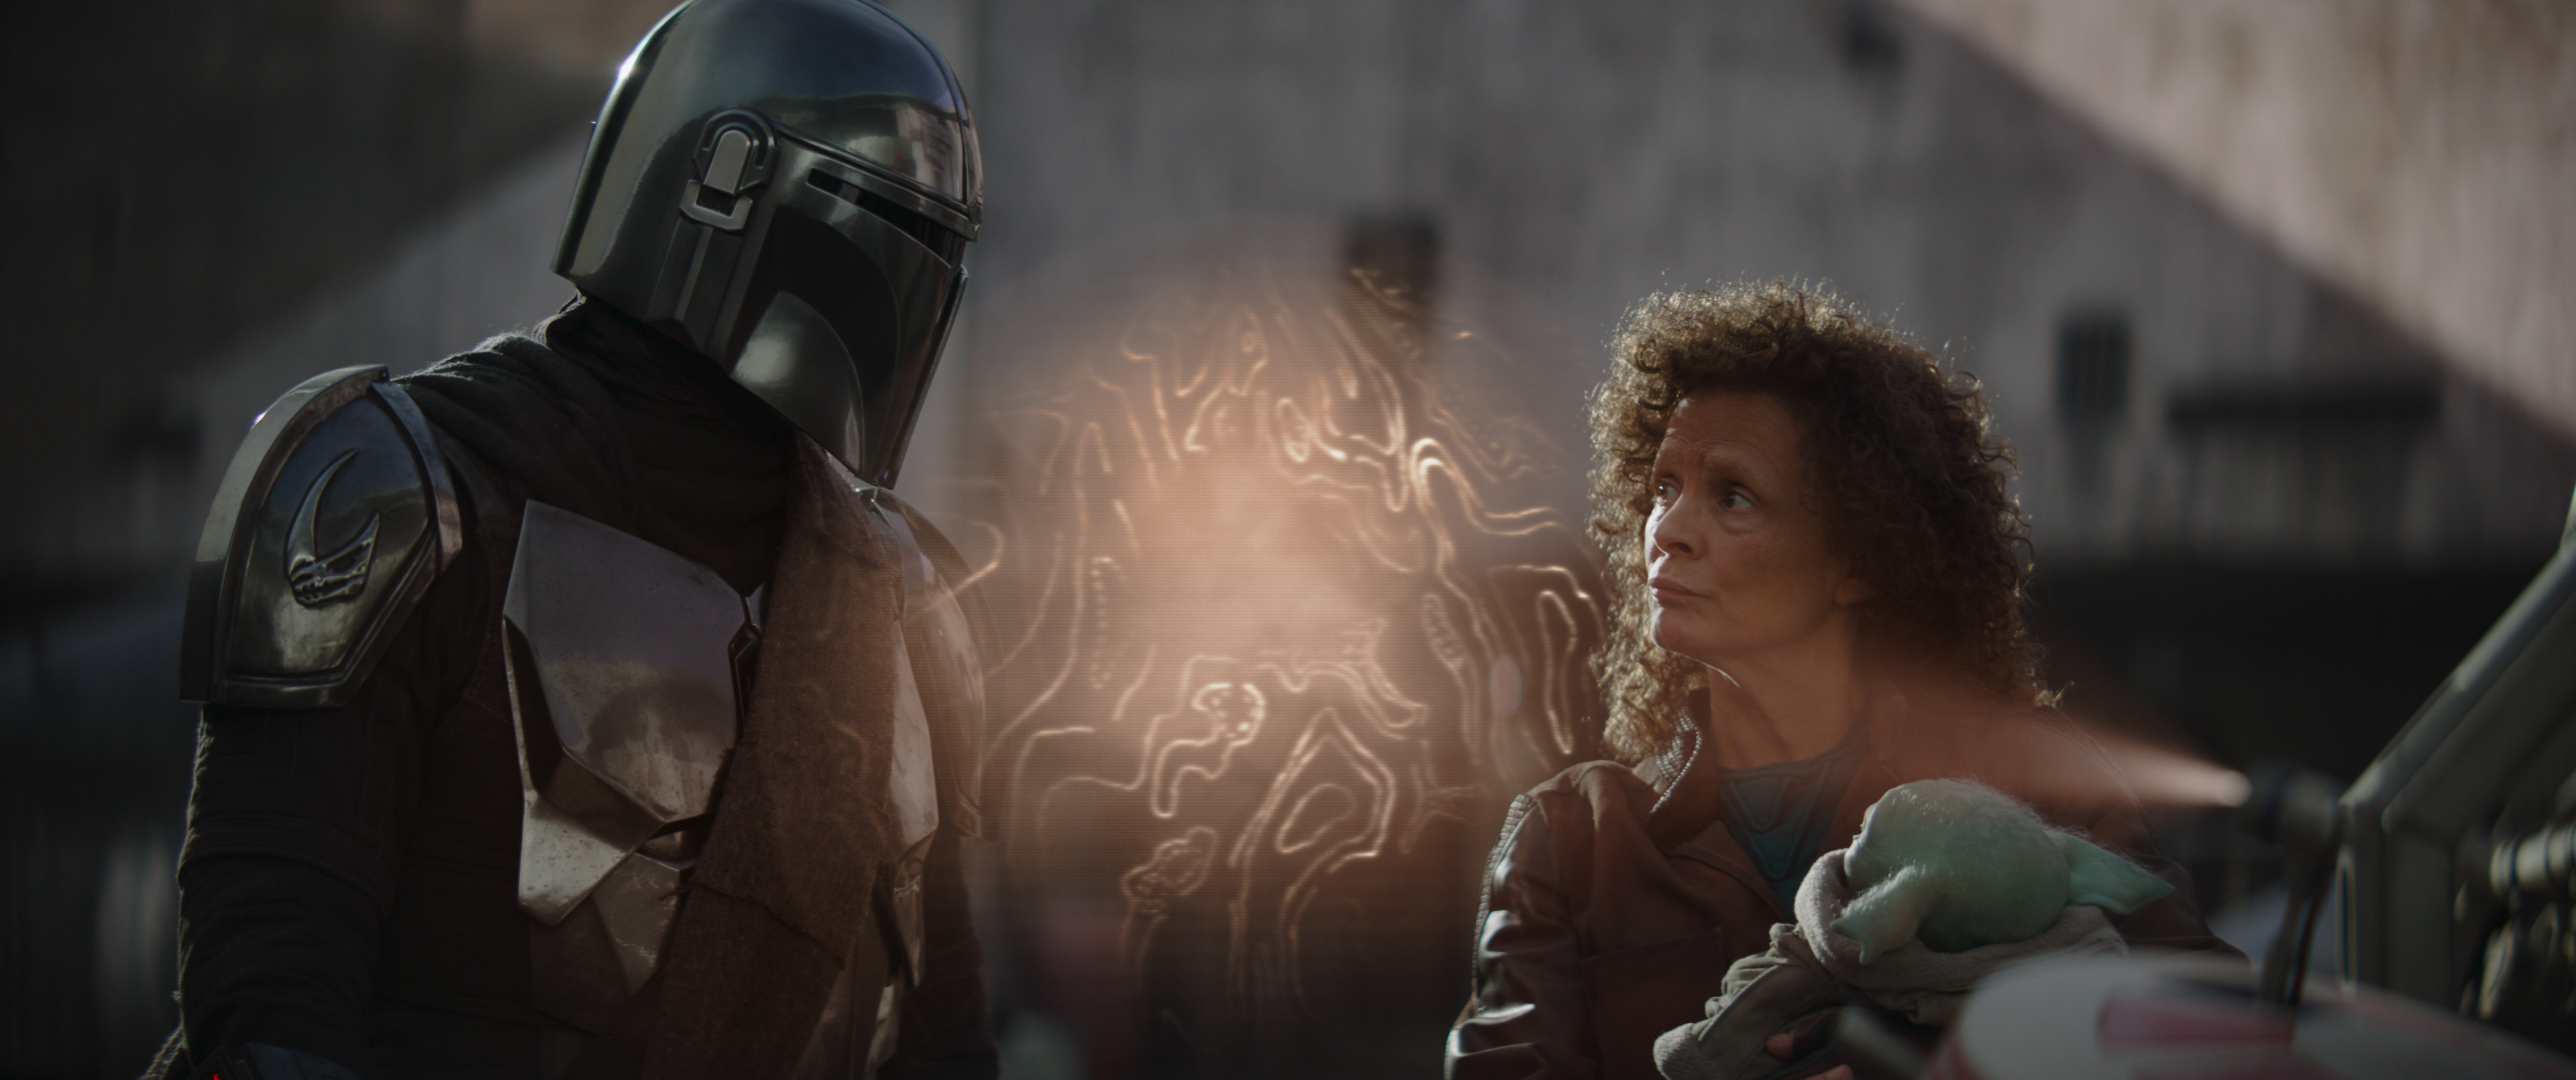 The Mandalorian' Season 2 Opener: A Favorite 'Star Wars' Character Makes A Cameo – Recap – Deadline